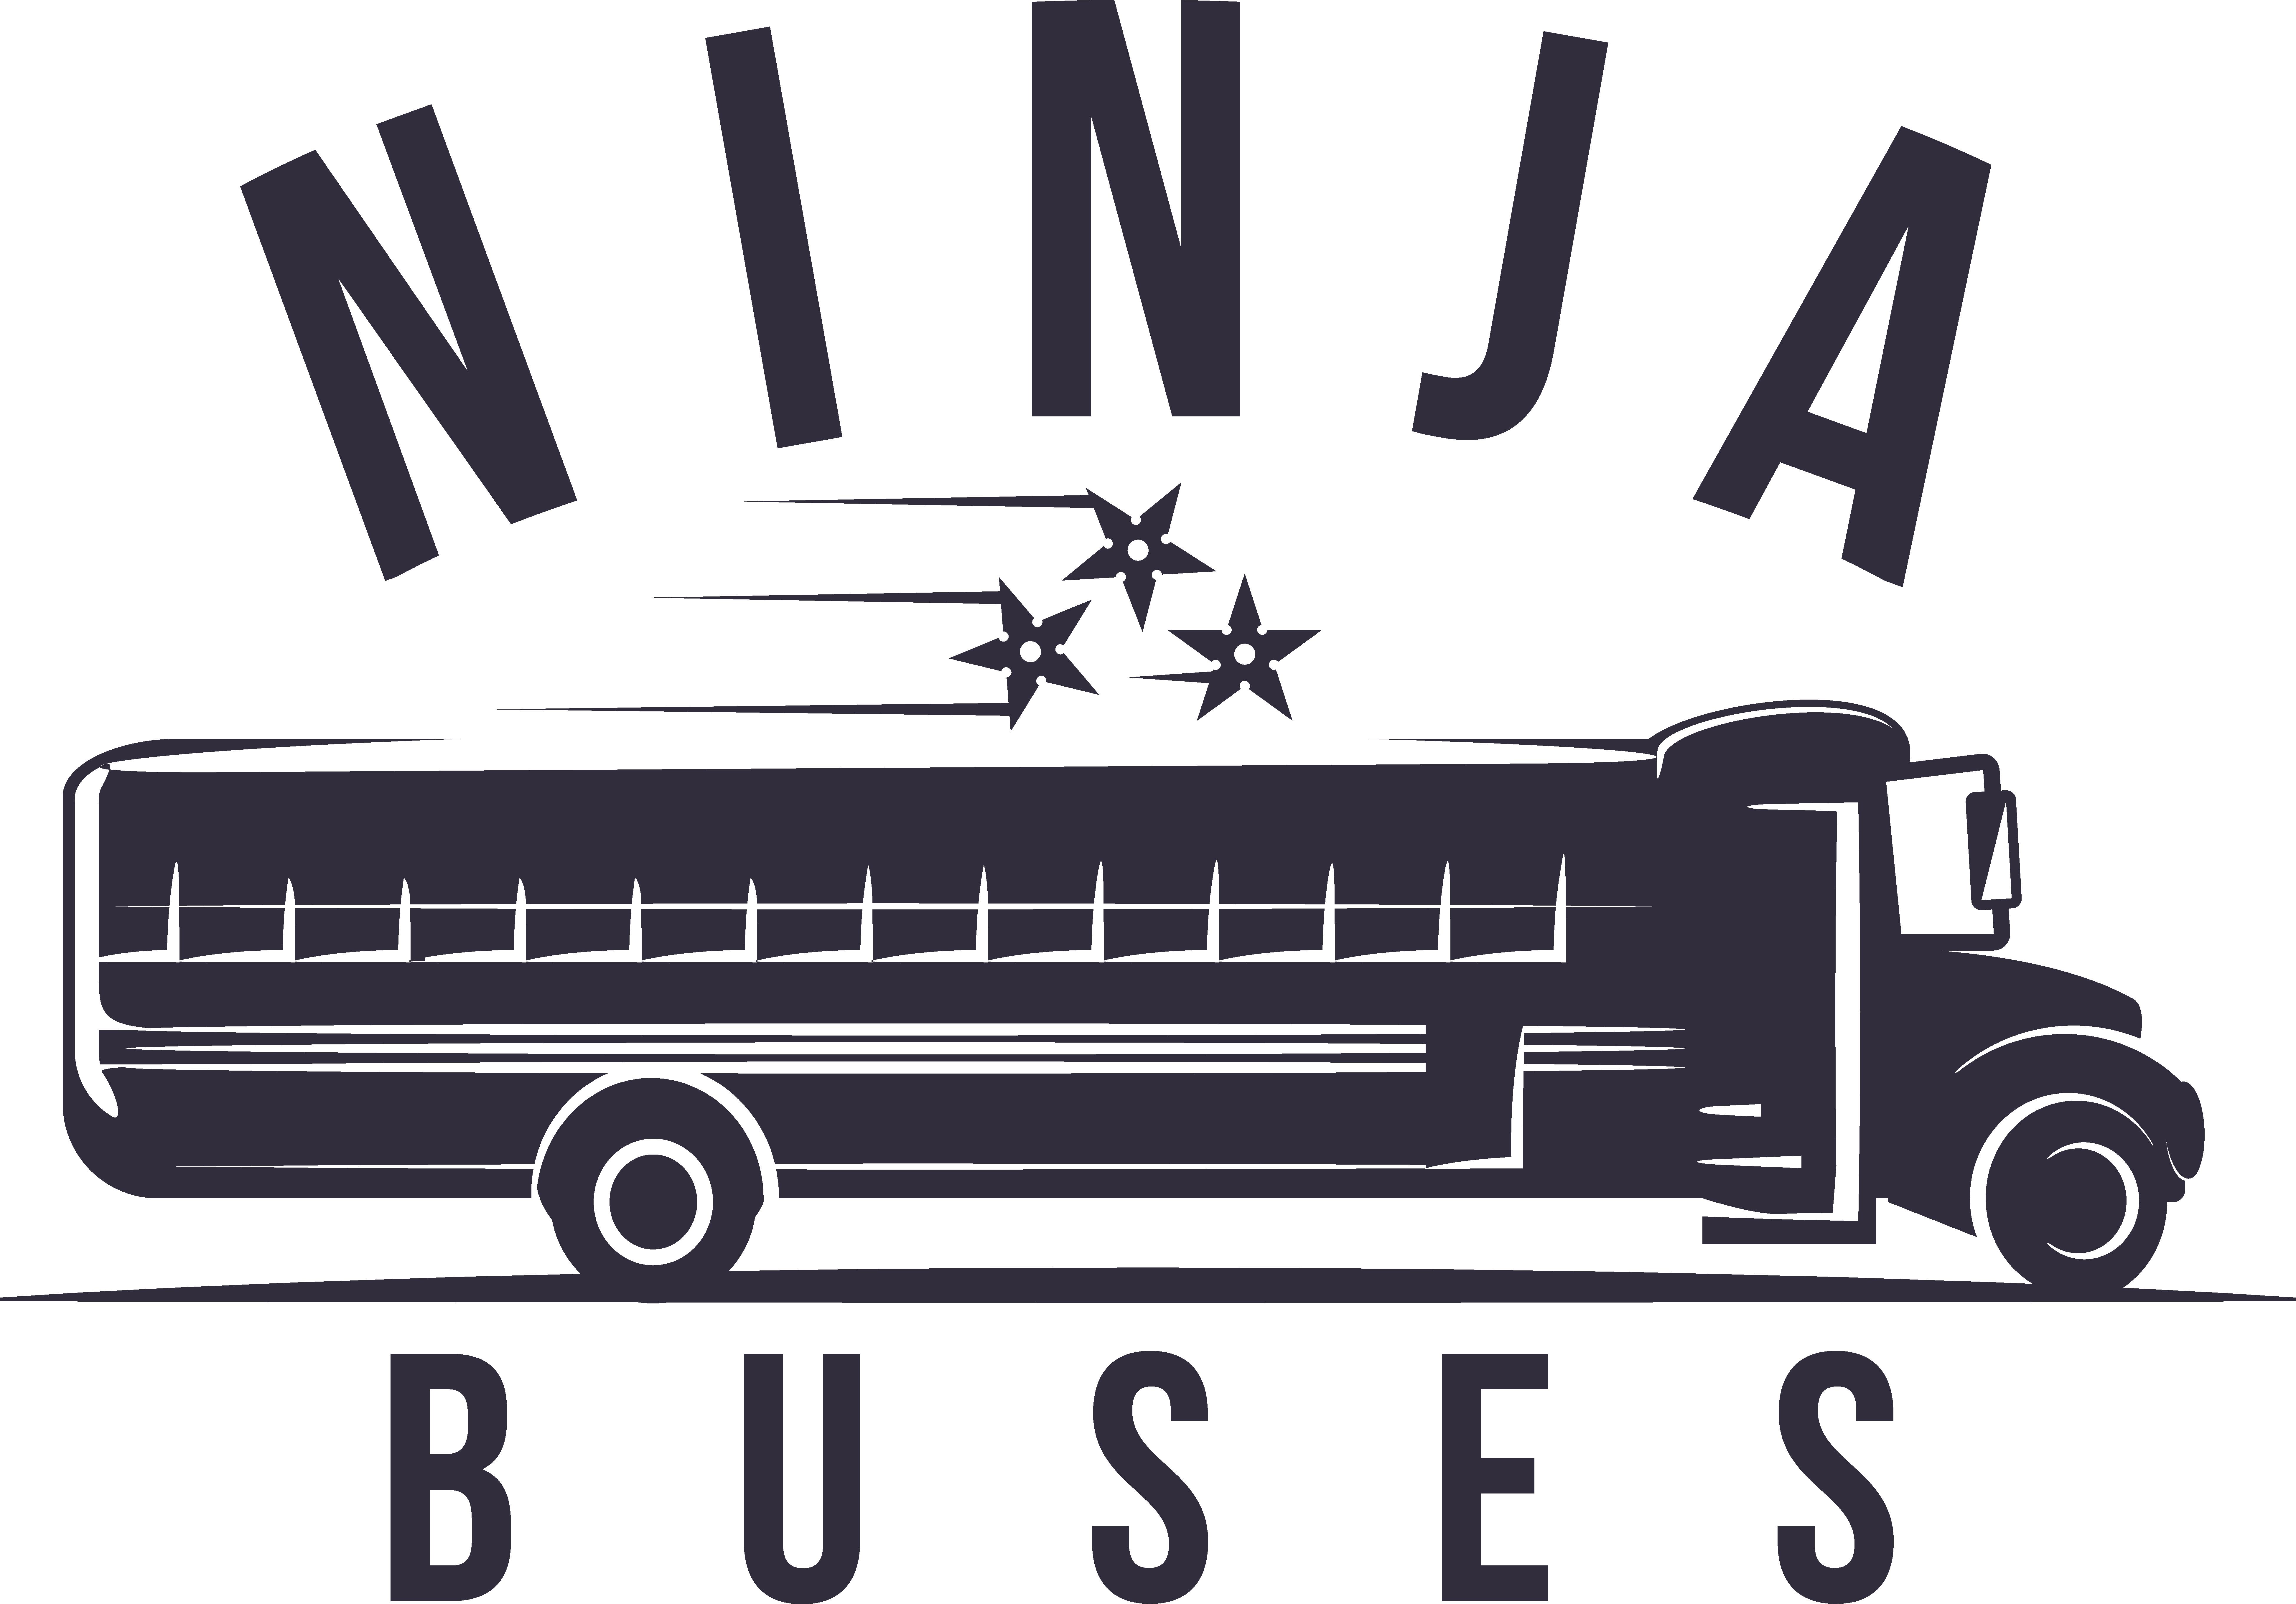 Create a sophisticated, yet cool logo for Ninja Buses (see ninjabuses.com)